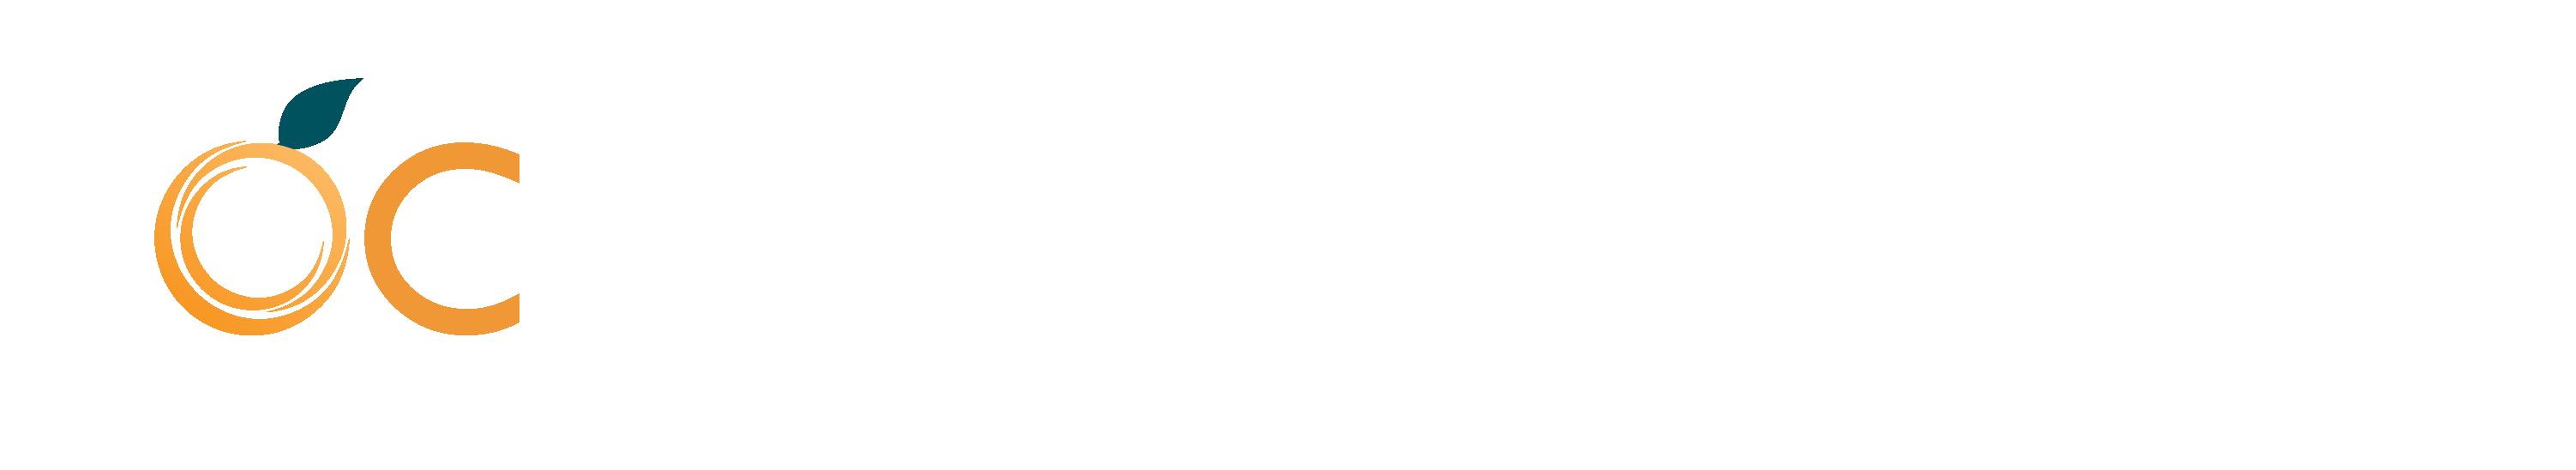 Orange County Housing & Community Development logo